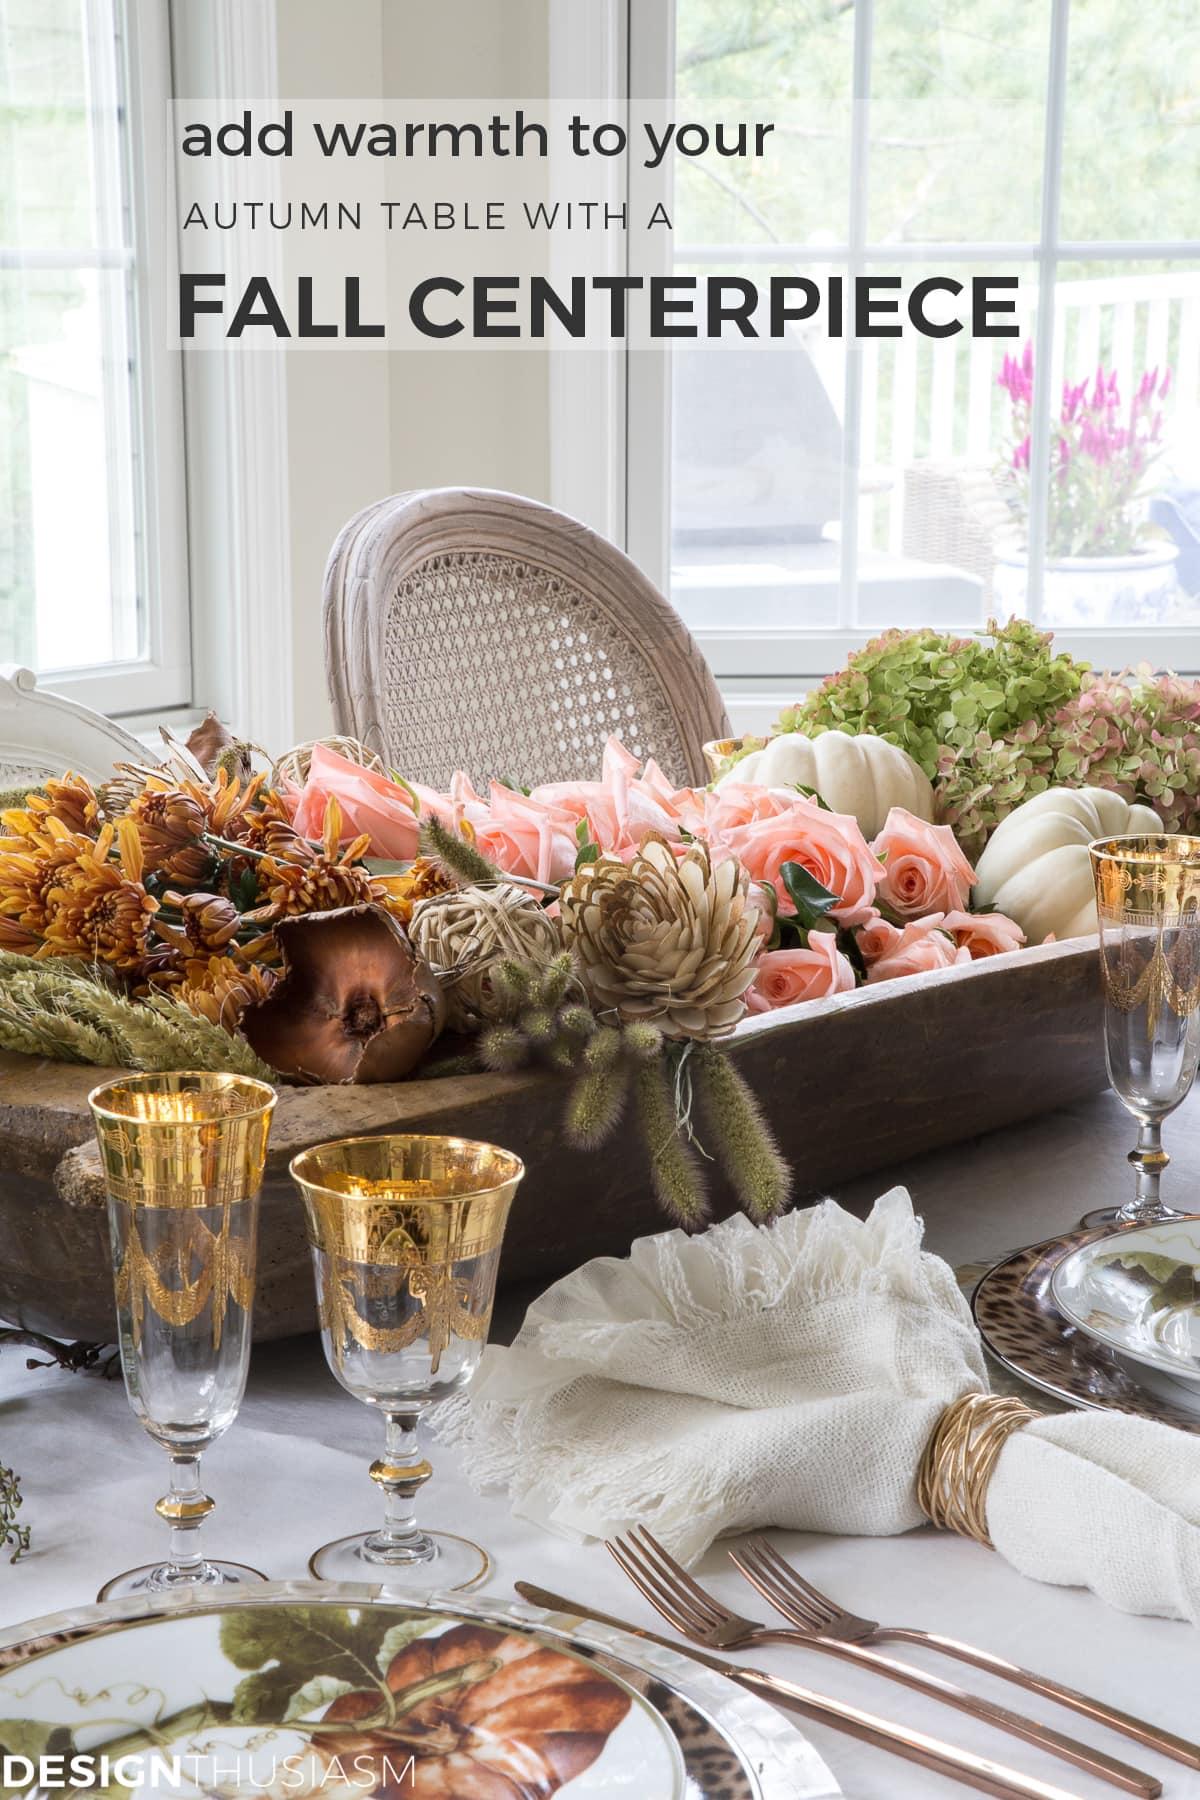 Thanksgiving tablescape with a dough bowl centerpiece